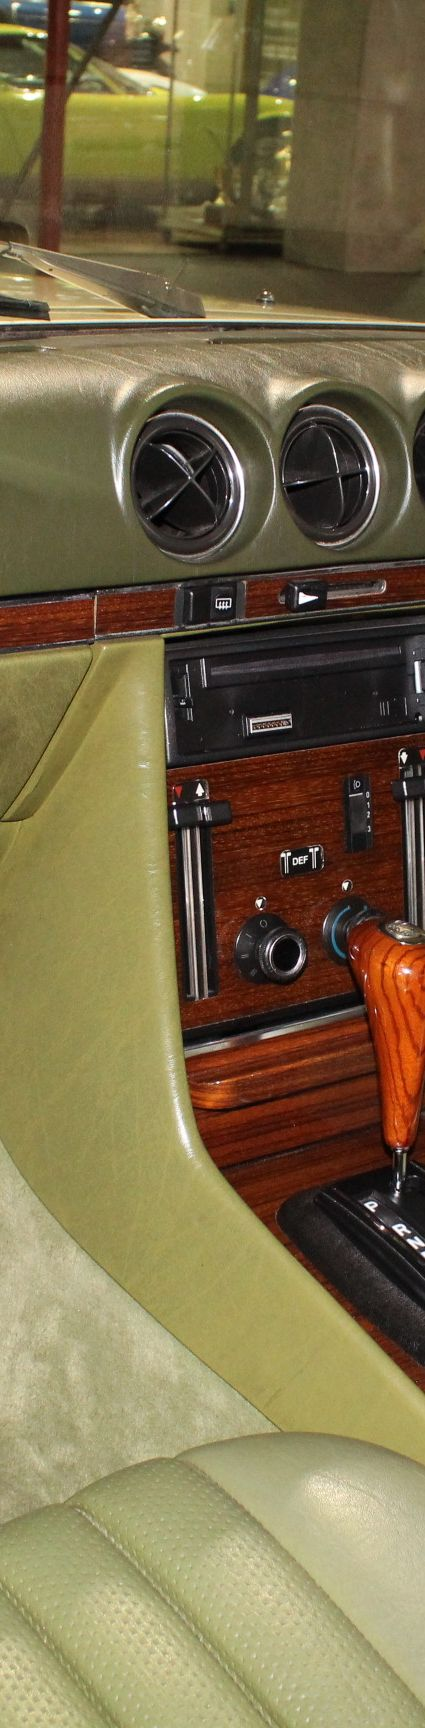 1982 Mercedes 380 SL - for sale in Australia